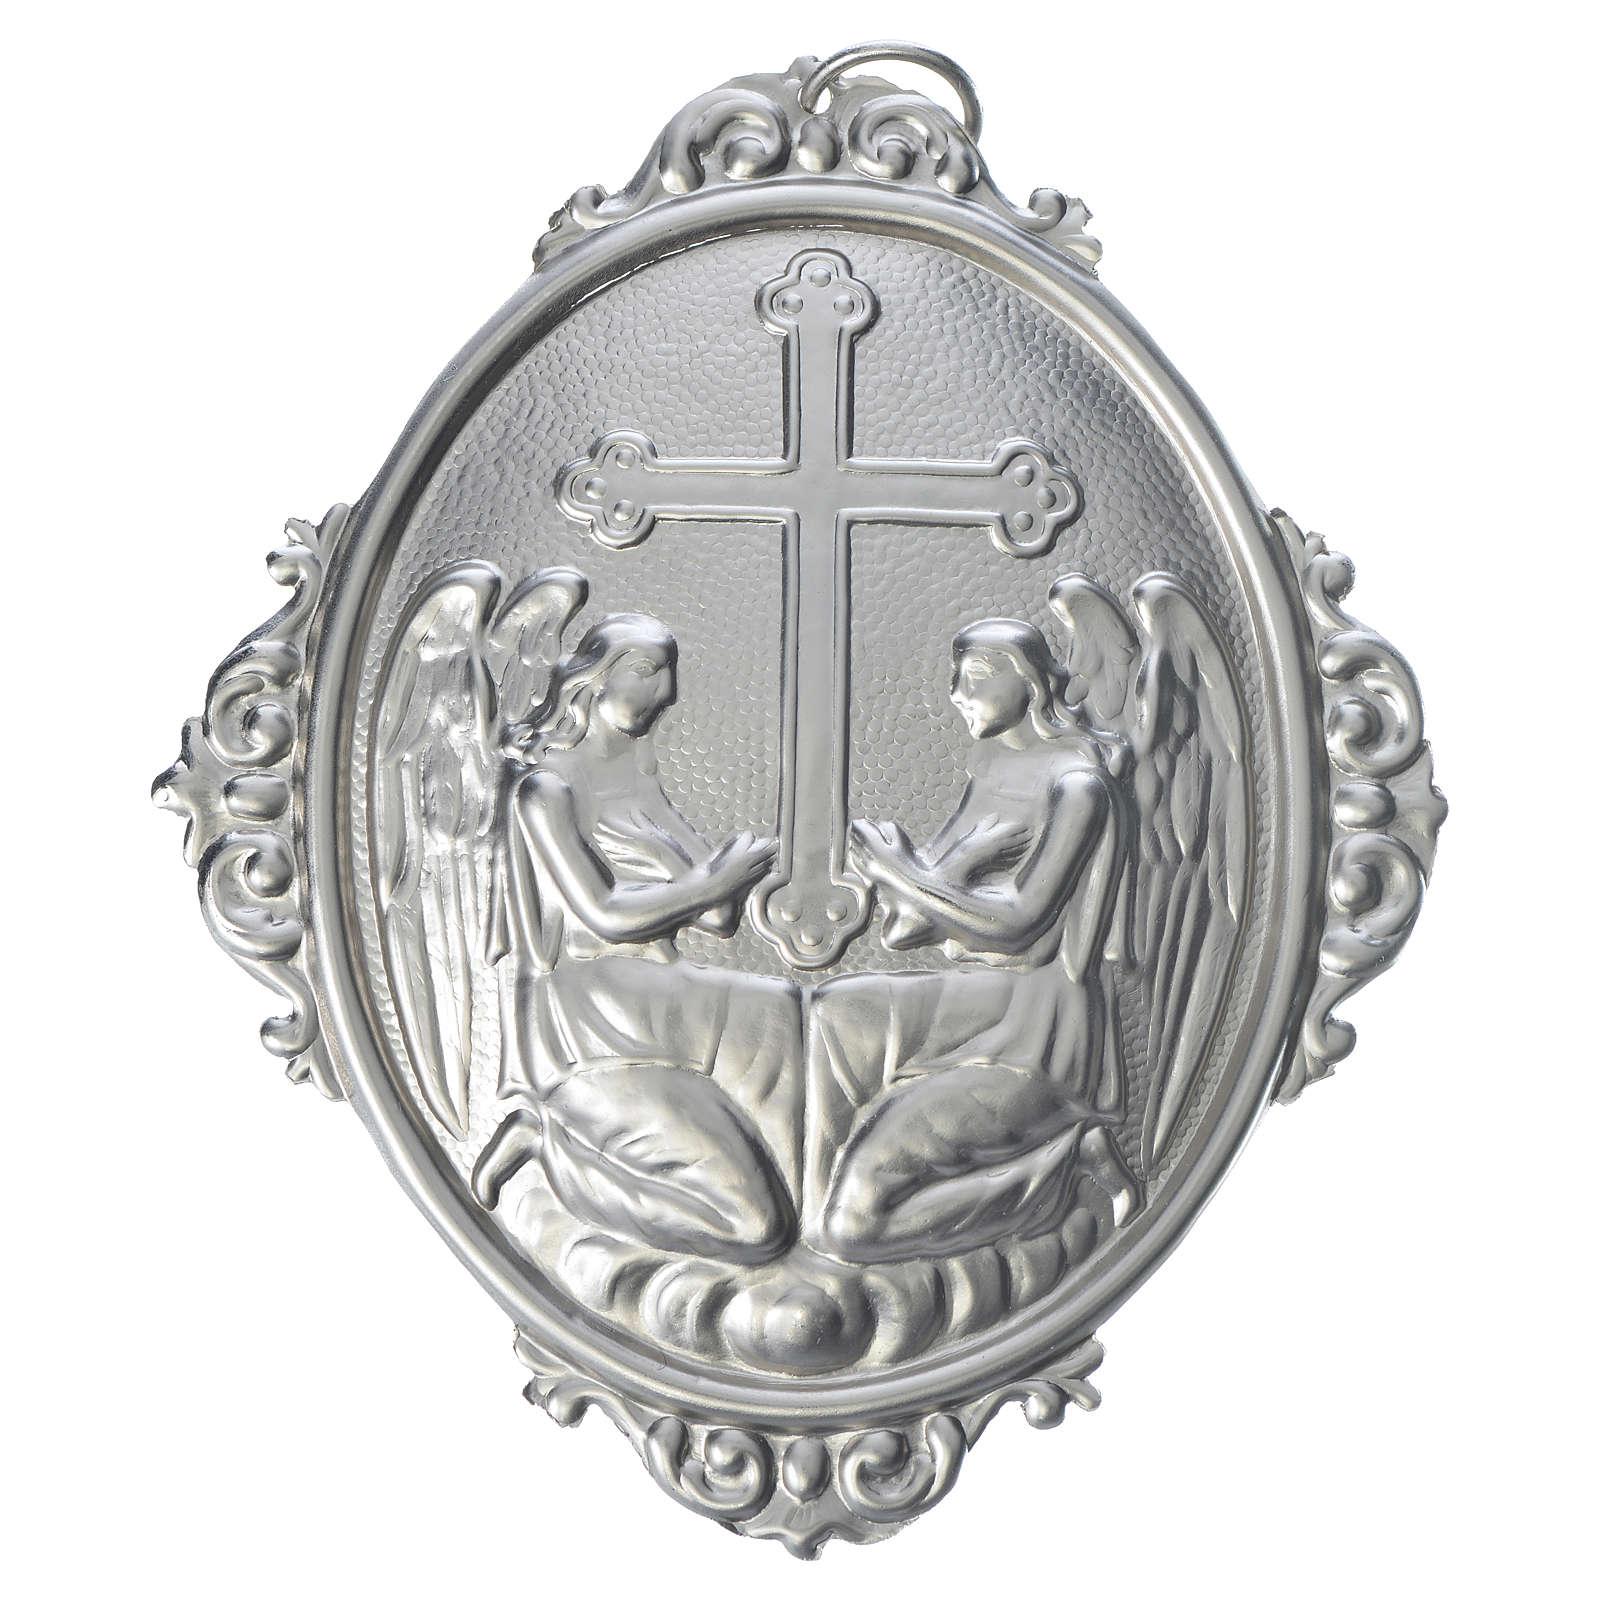 Medalla cofradía Angeles con cruz latón 3